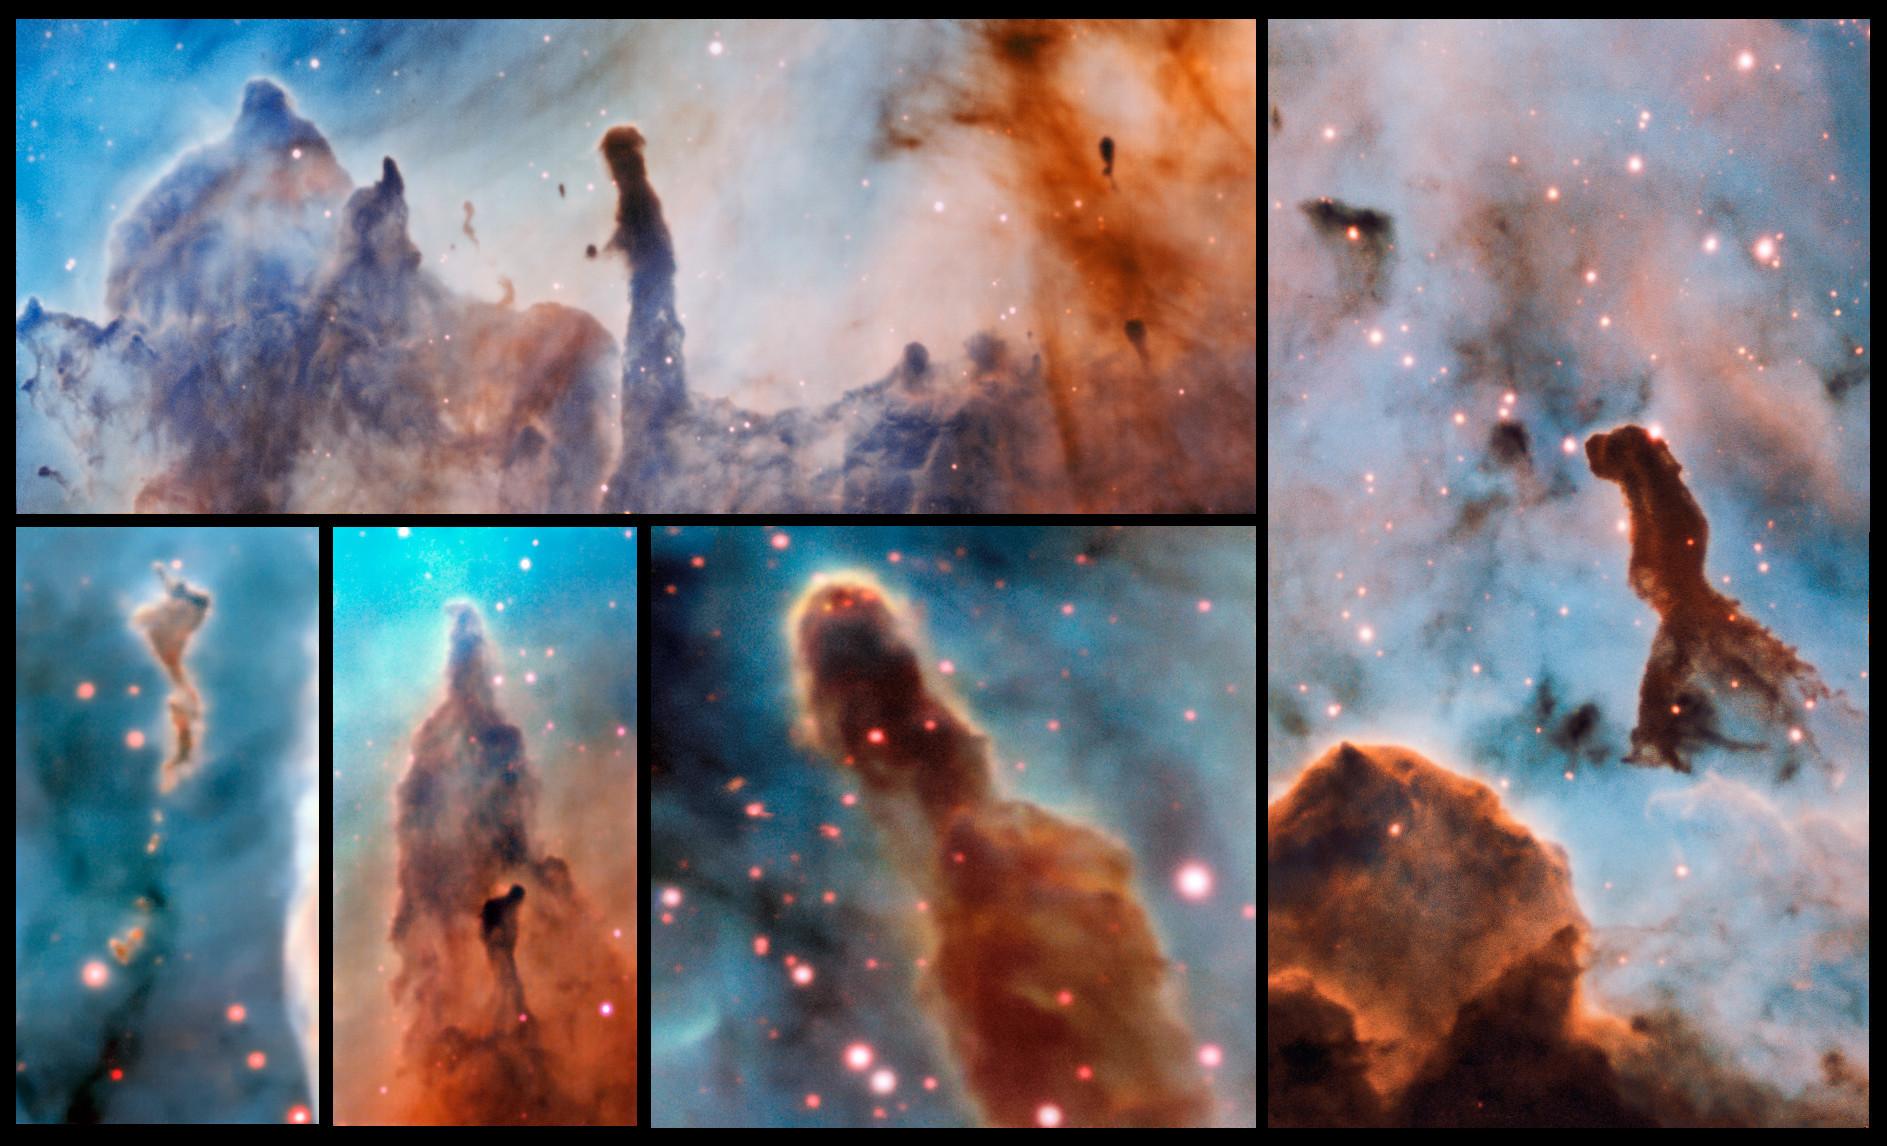 Several pillars within the Carina Nebula.